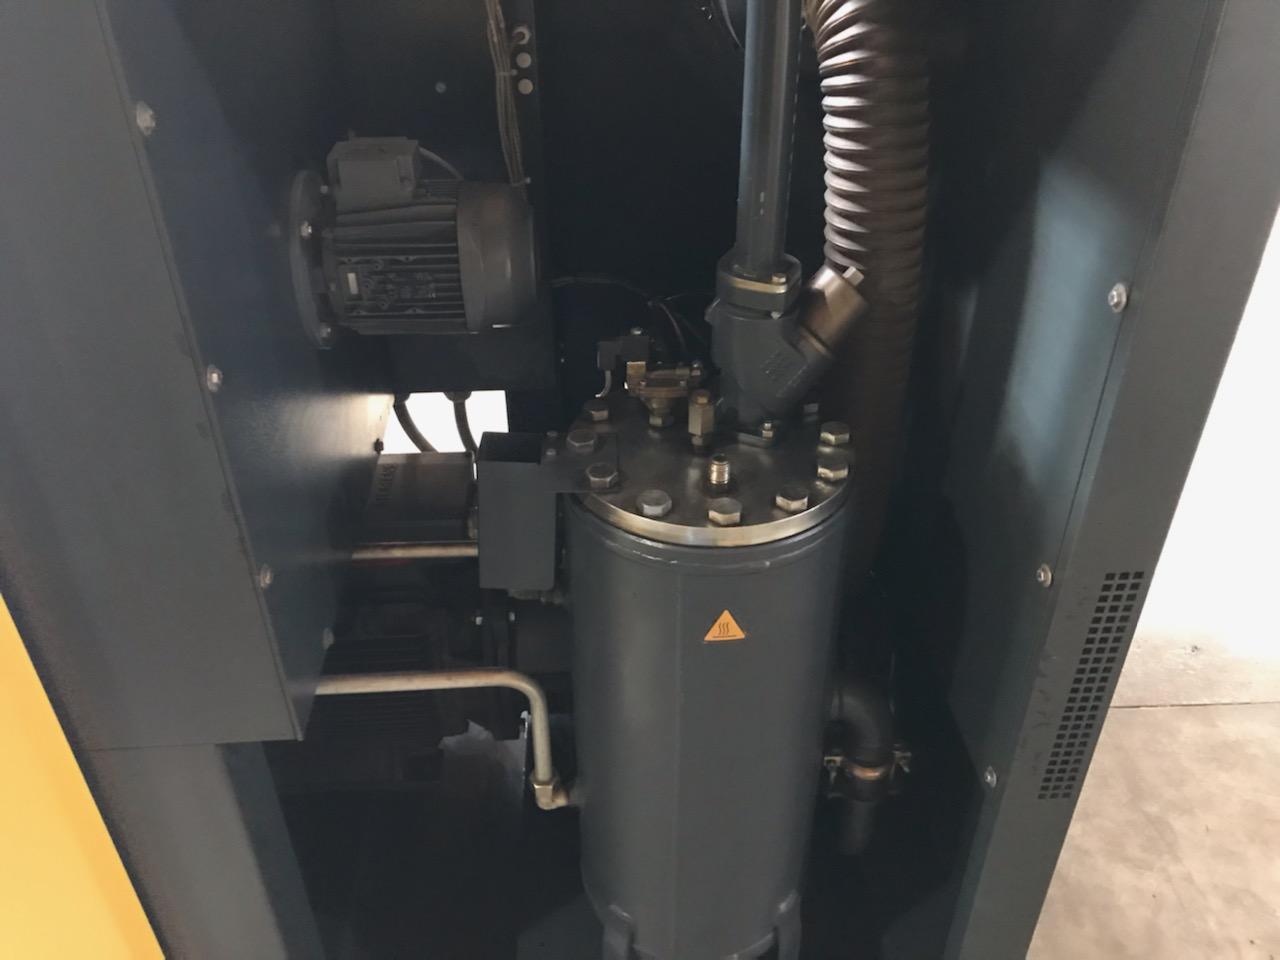 Kaeser BSD 50, 50 Hp, 241 cfm, Rotary Screw air compressor